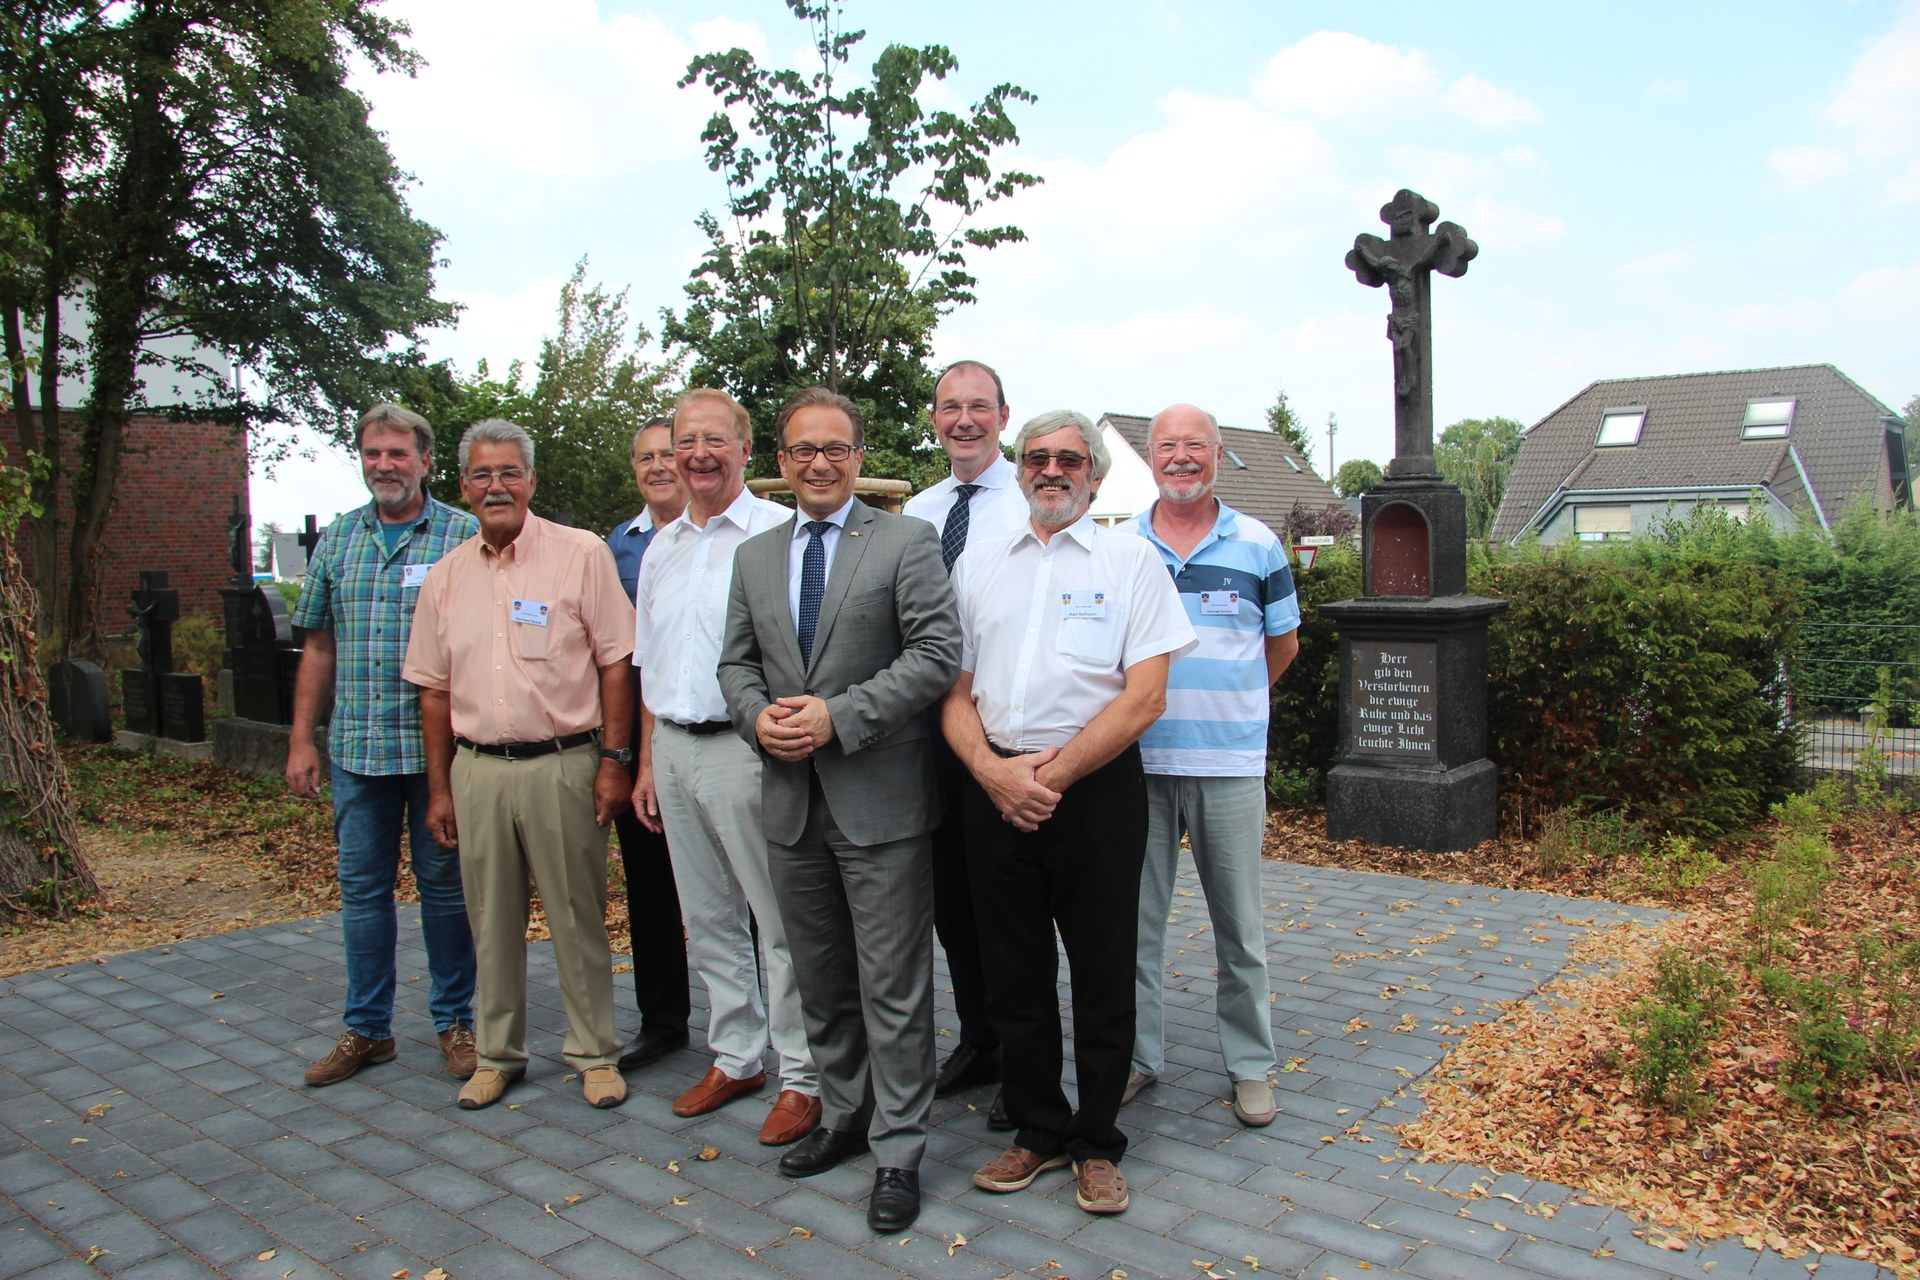 Alter Friedhof Hoisten offiziell eingeweiht